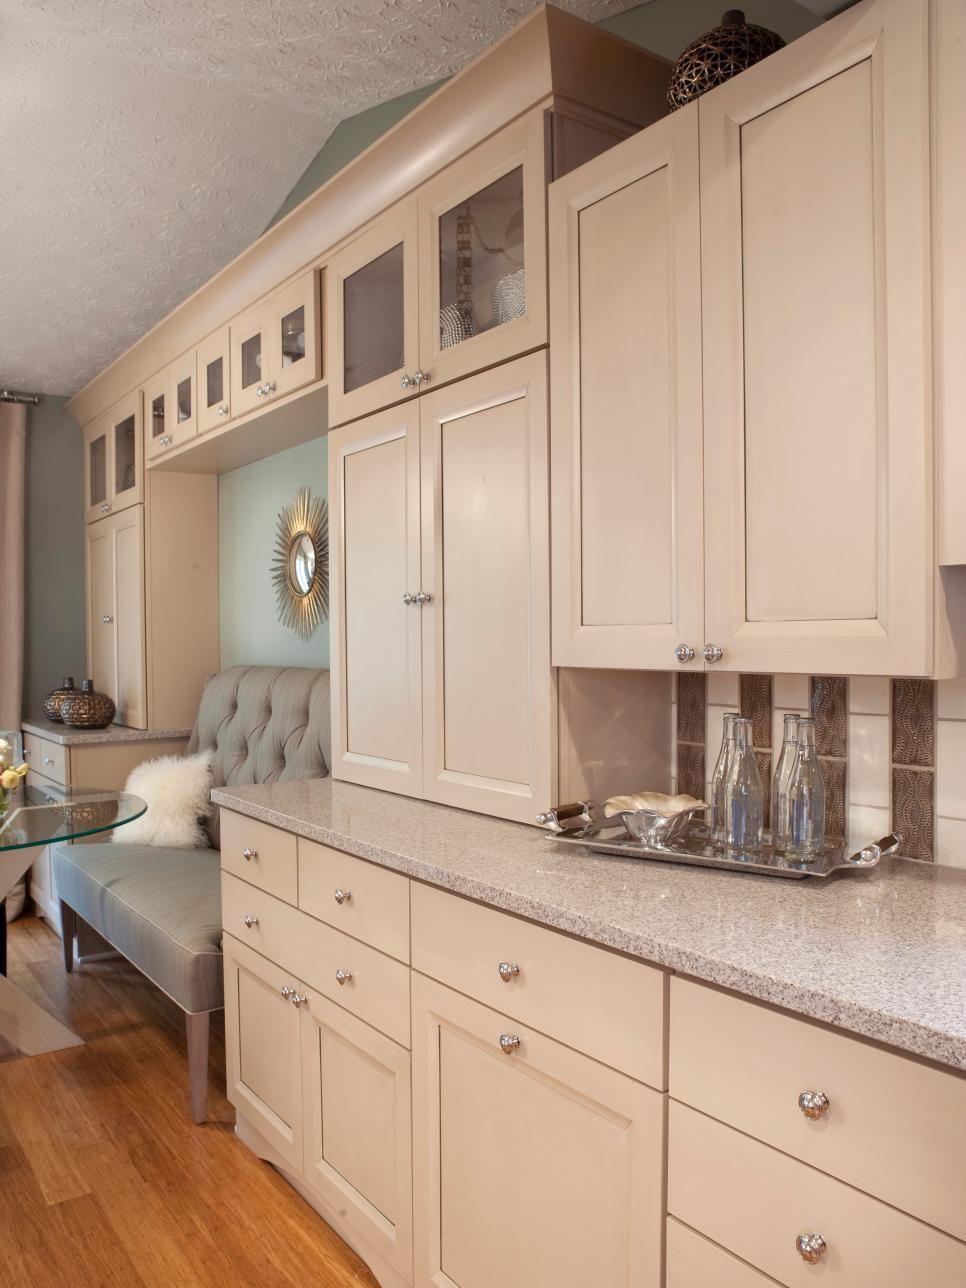 Best Maple Cabinets With An Irish Creme Finish Quartz 400 x 300